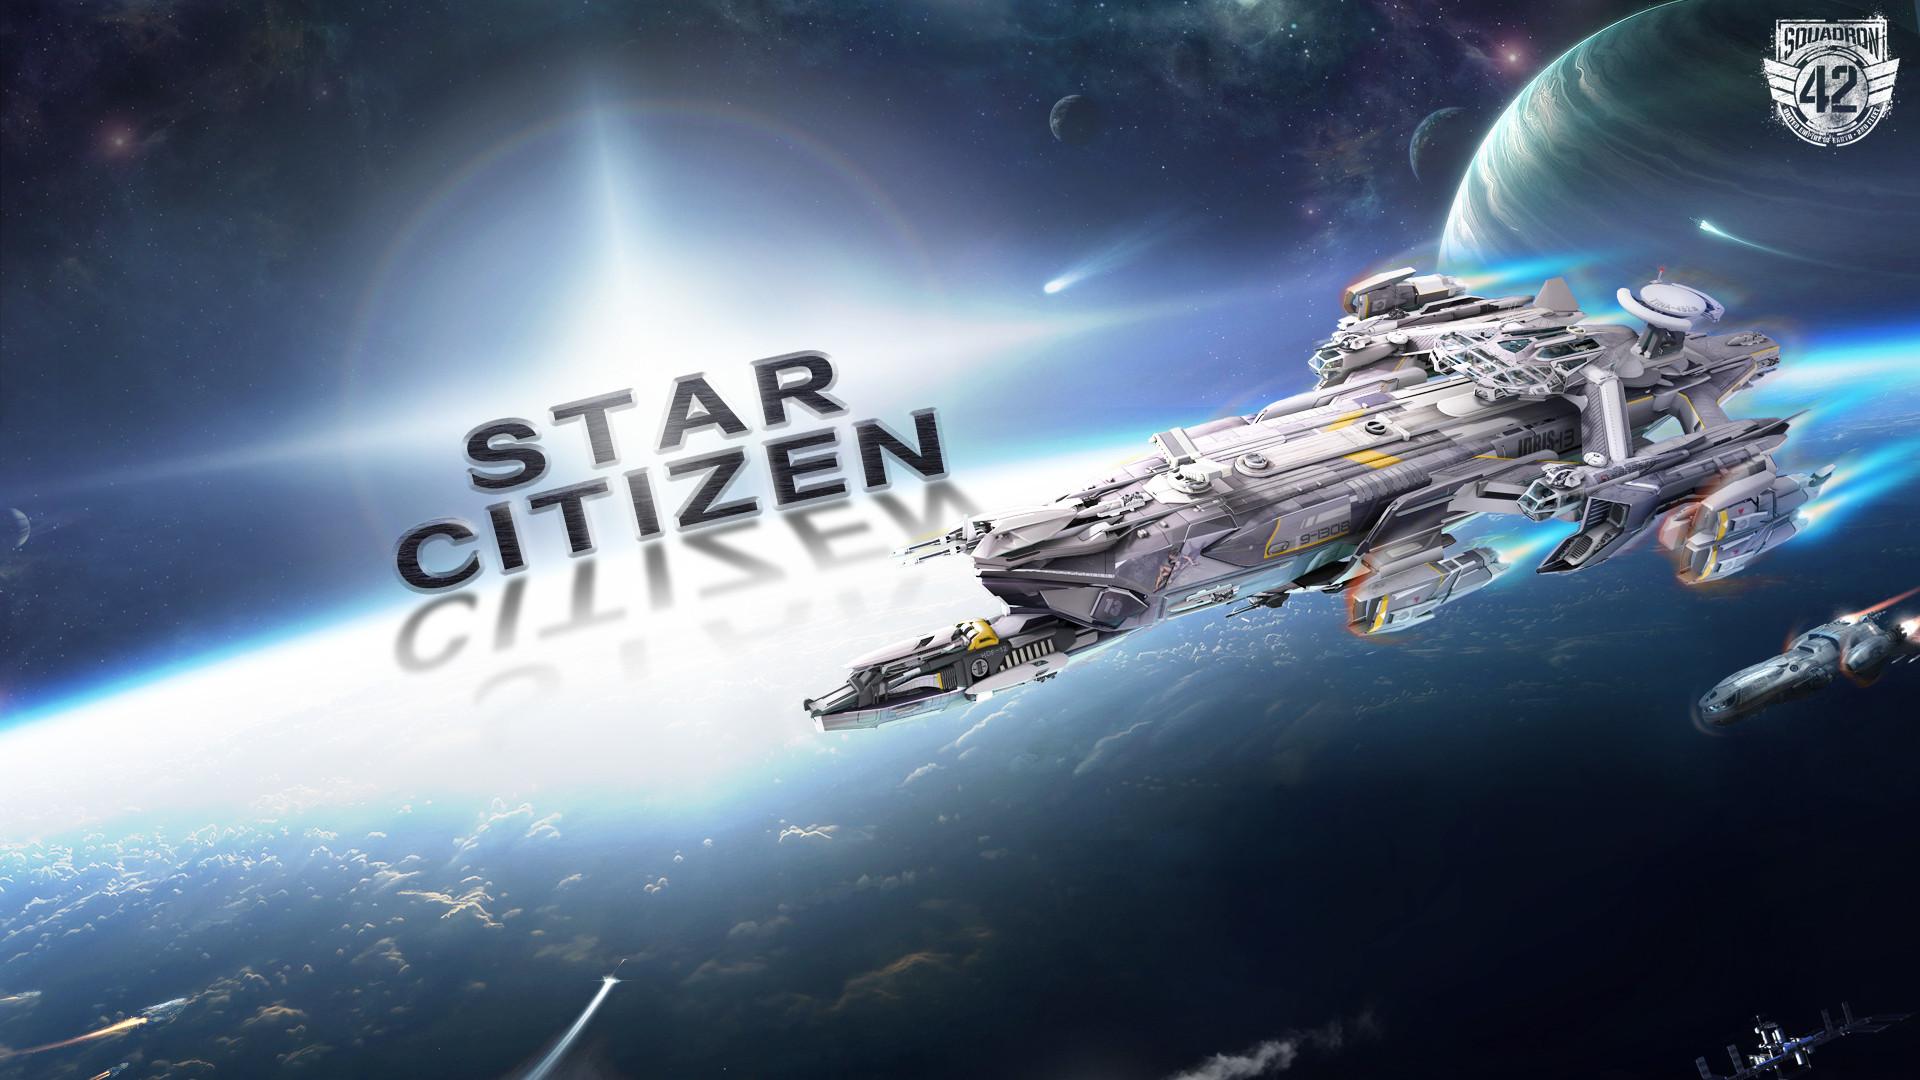 Геймплей шутера на рельсах Star Citizen